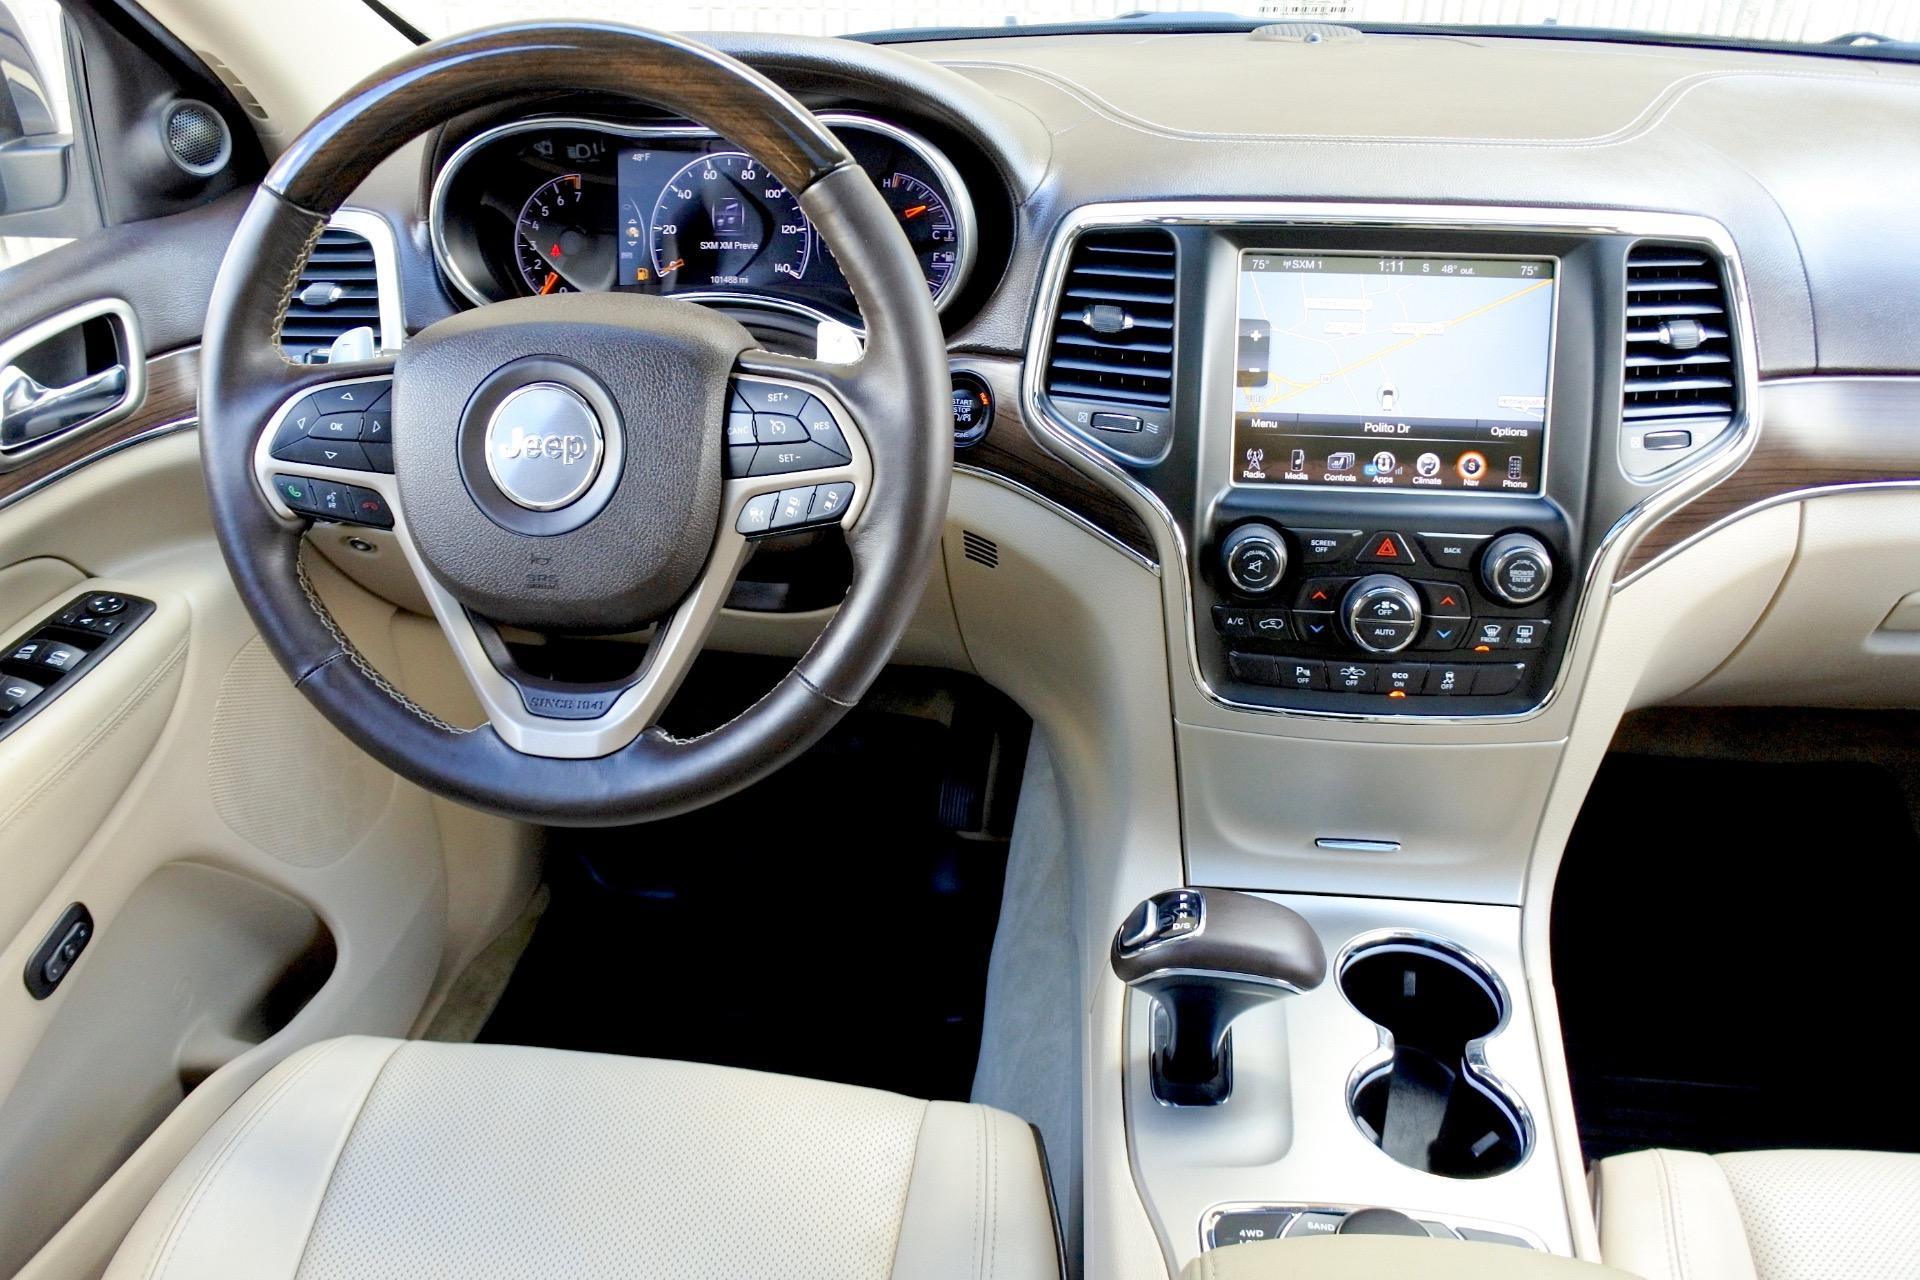 Used 2014 Jeep Grand Cherokee Overland 4WD Used 2014 Jeep Grand Cherokee Overland 4WD for sale  at Metro West Motorcars LLC in Shrewsbury MA 10